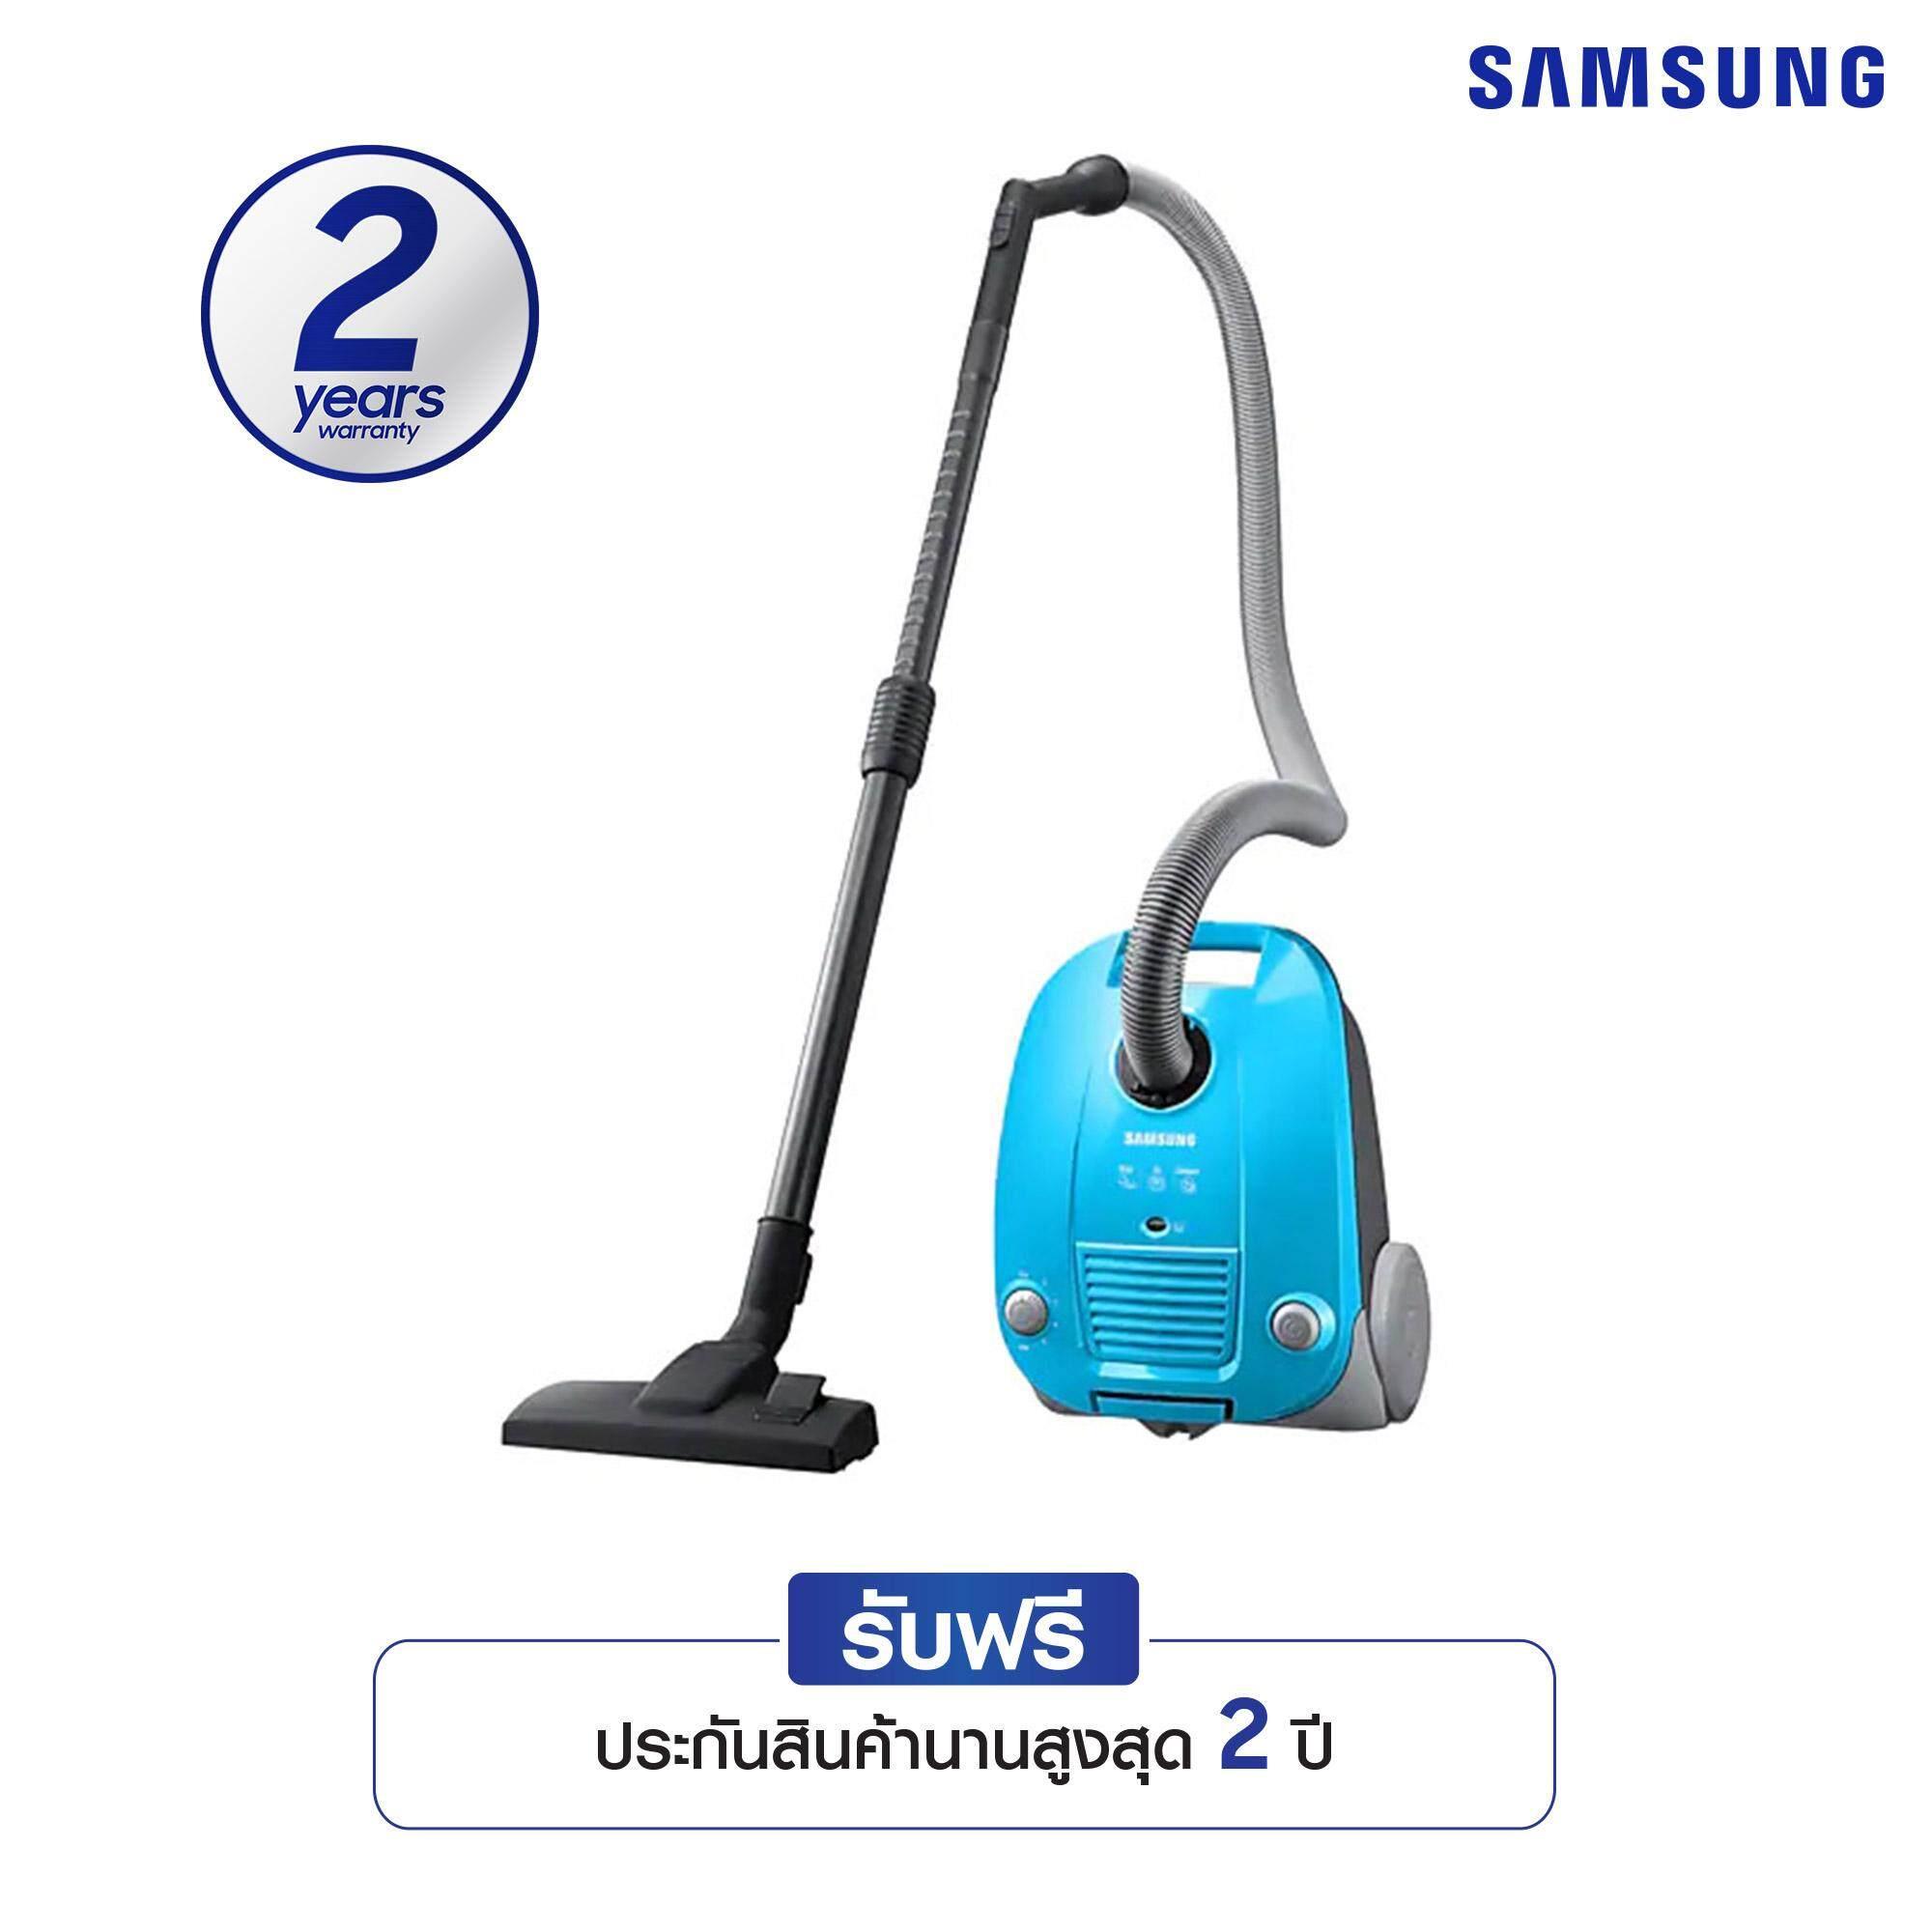 Samsung เครื่องดูดฝุ่น Easy Dust Blowing 1800W รุ่น VCC4180V36/XST